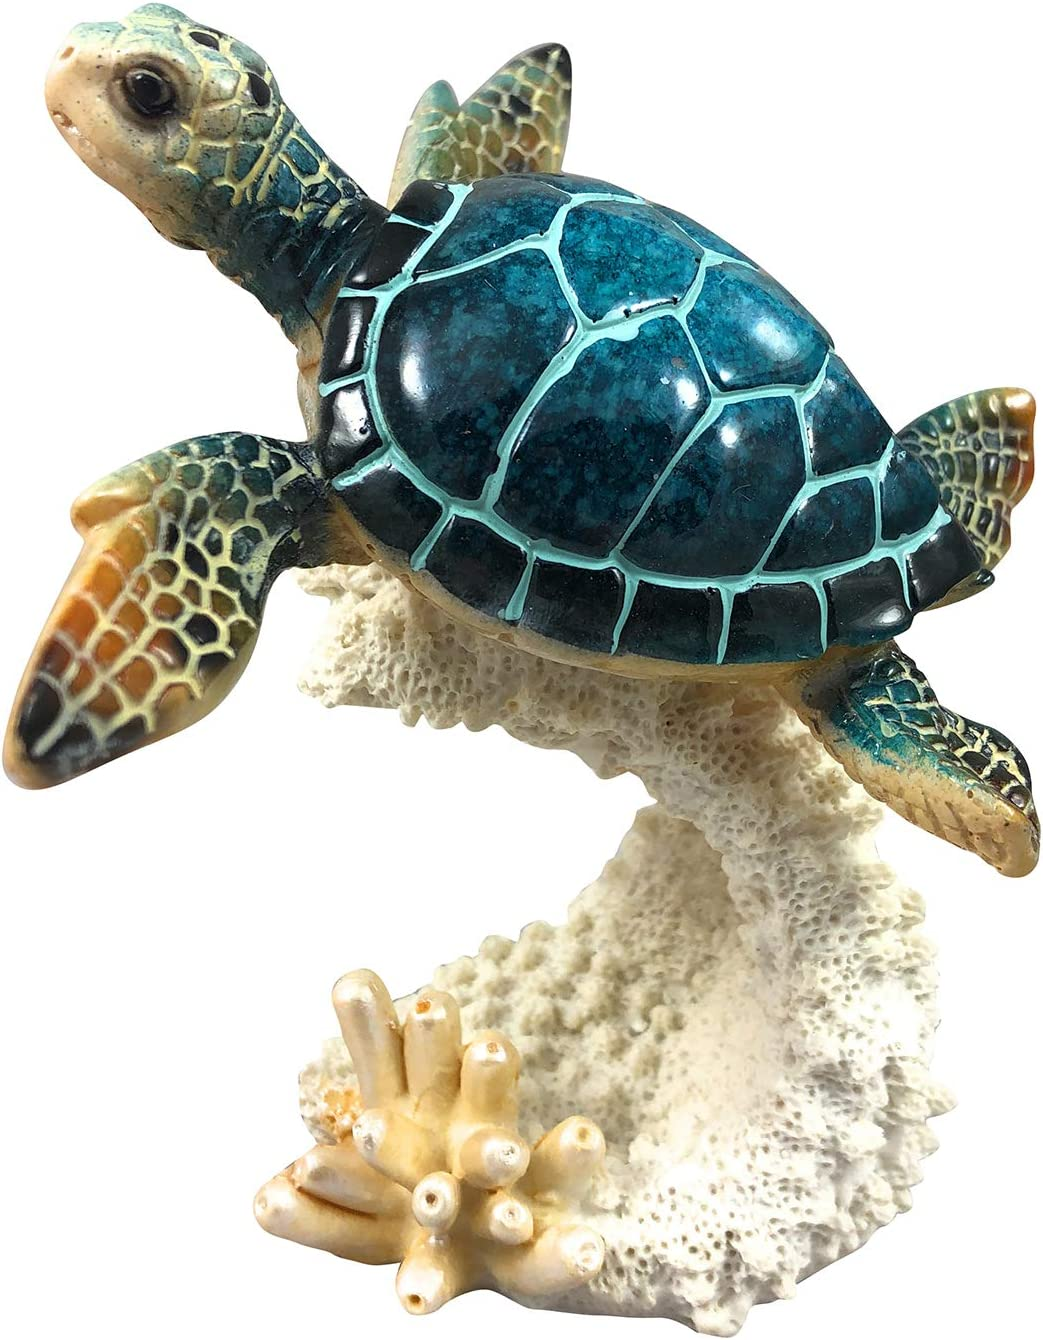 "Yellow Moon Gifts Blue Sea Turtle Coral Resin 5"" Figurine Statue Ocean Marine Decor"